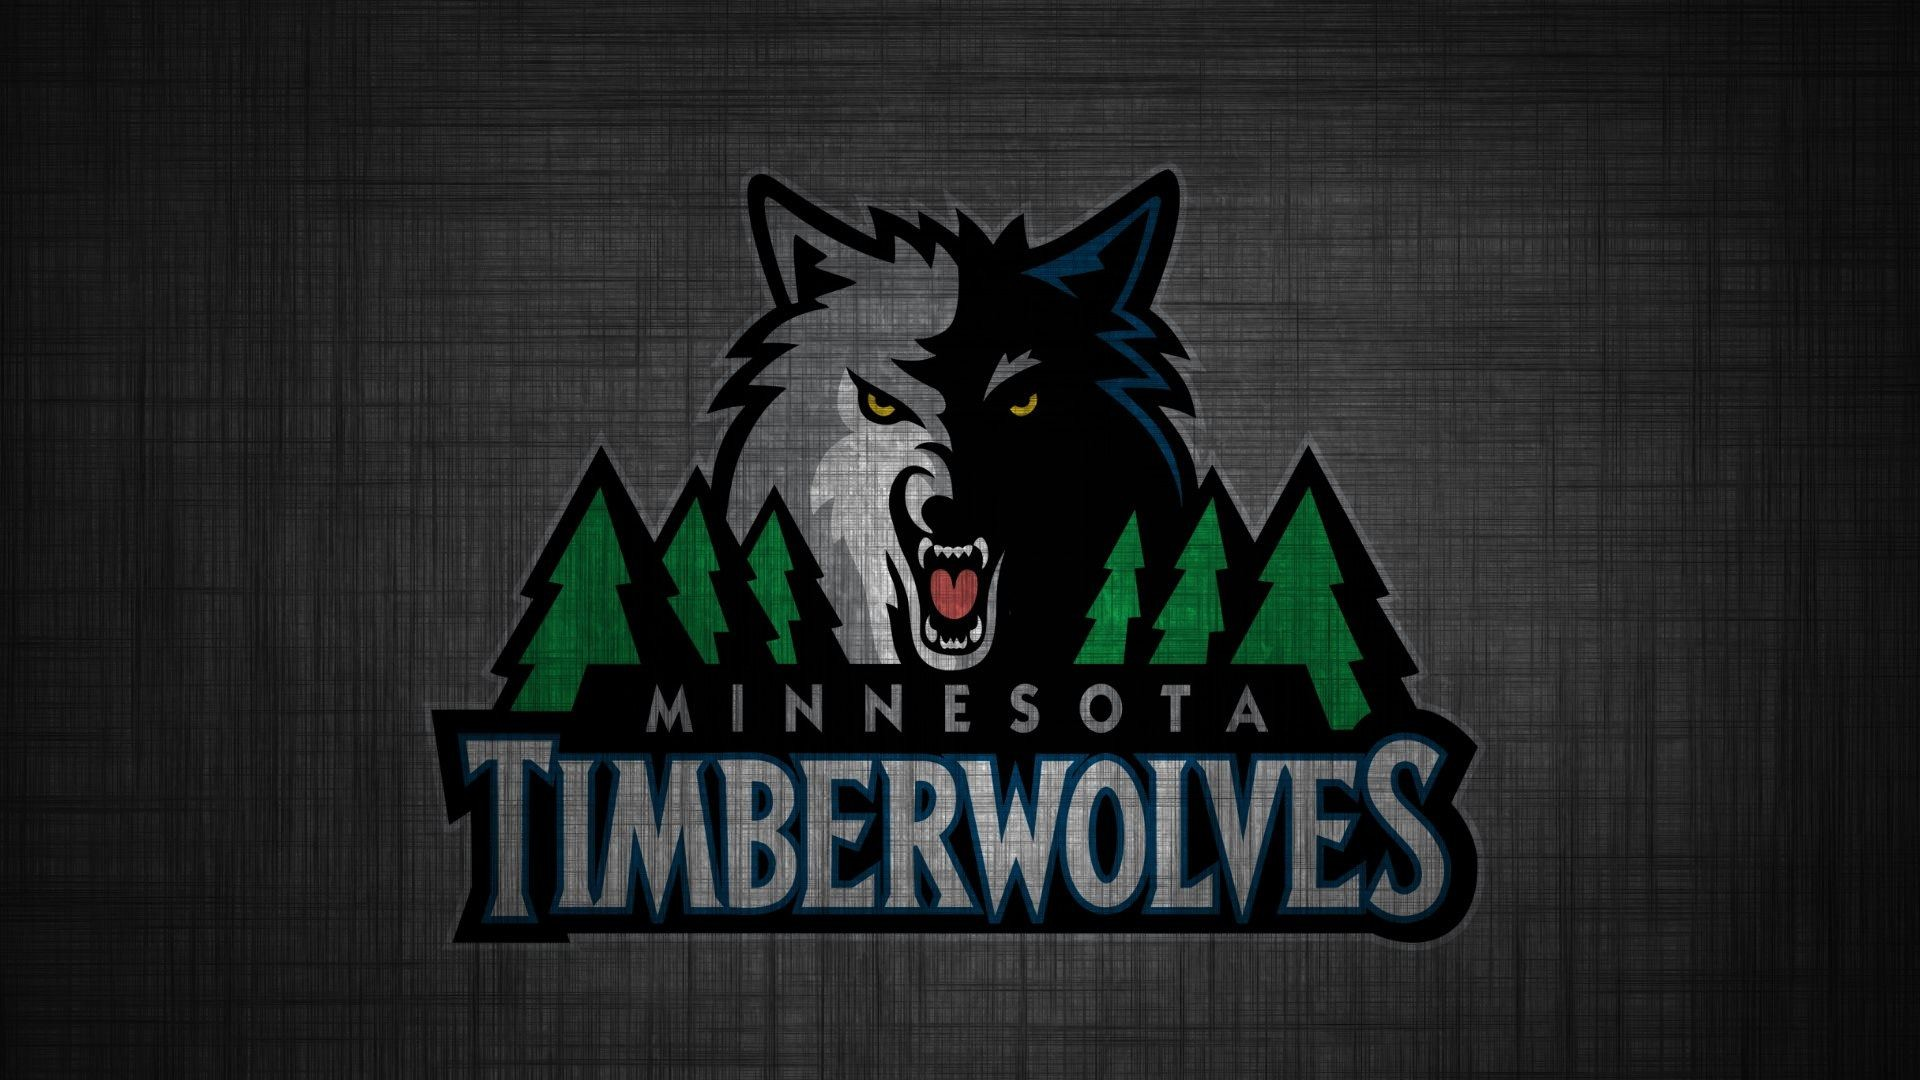 Minnesota Timberwolves Wallpaper 56 images 1920x1080